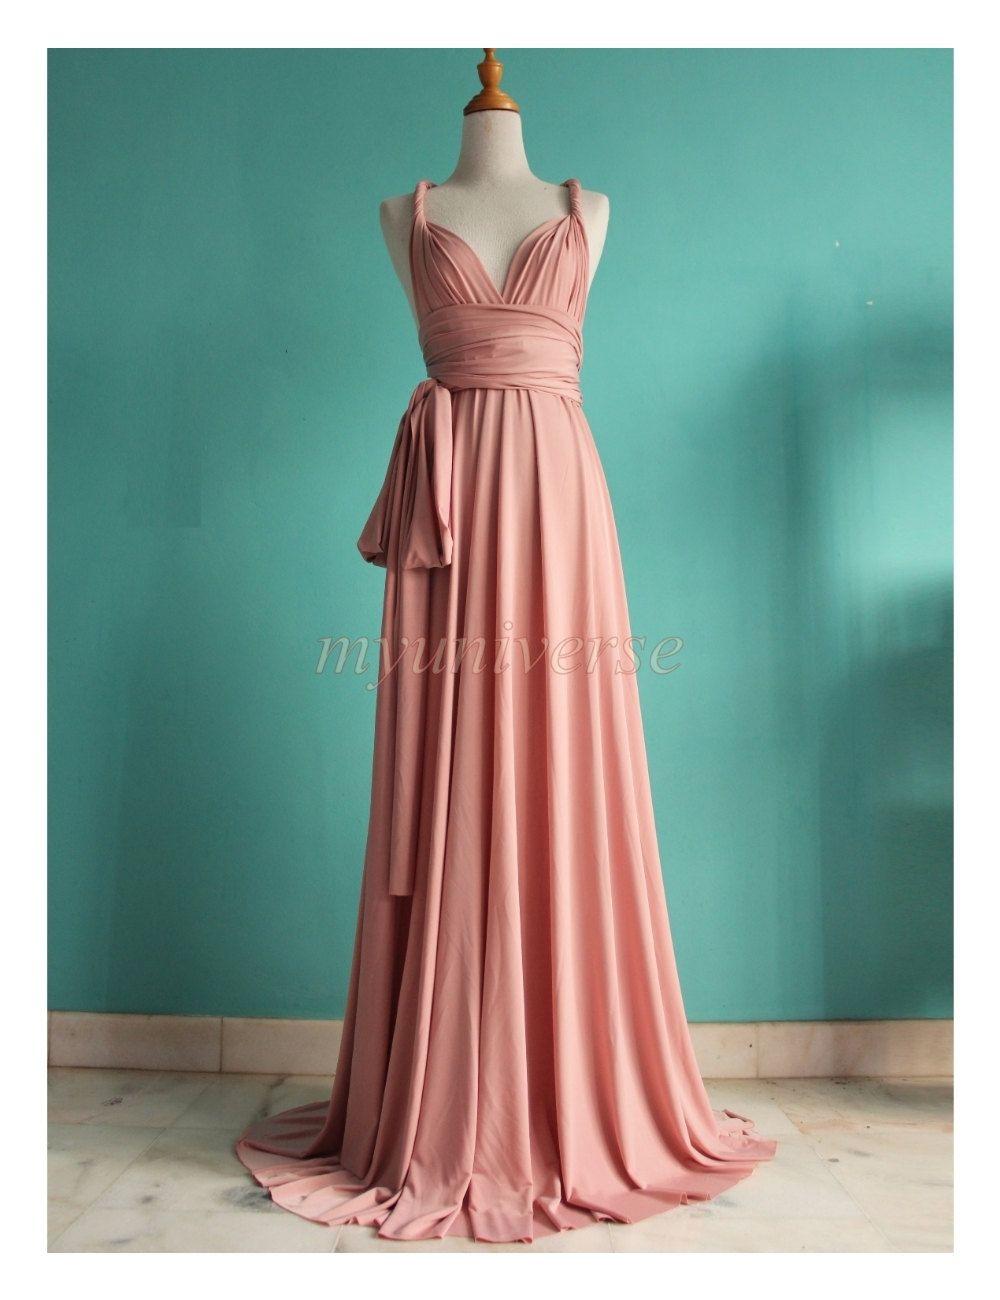 Wedding Bridesmaid Dress Wrap Convertible Dress Pastel Peach ...